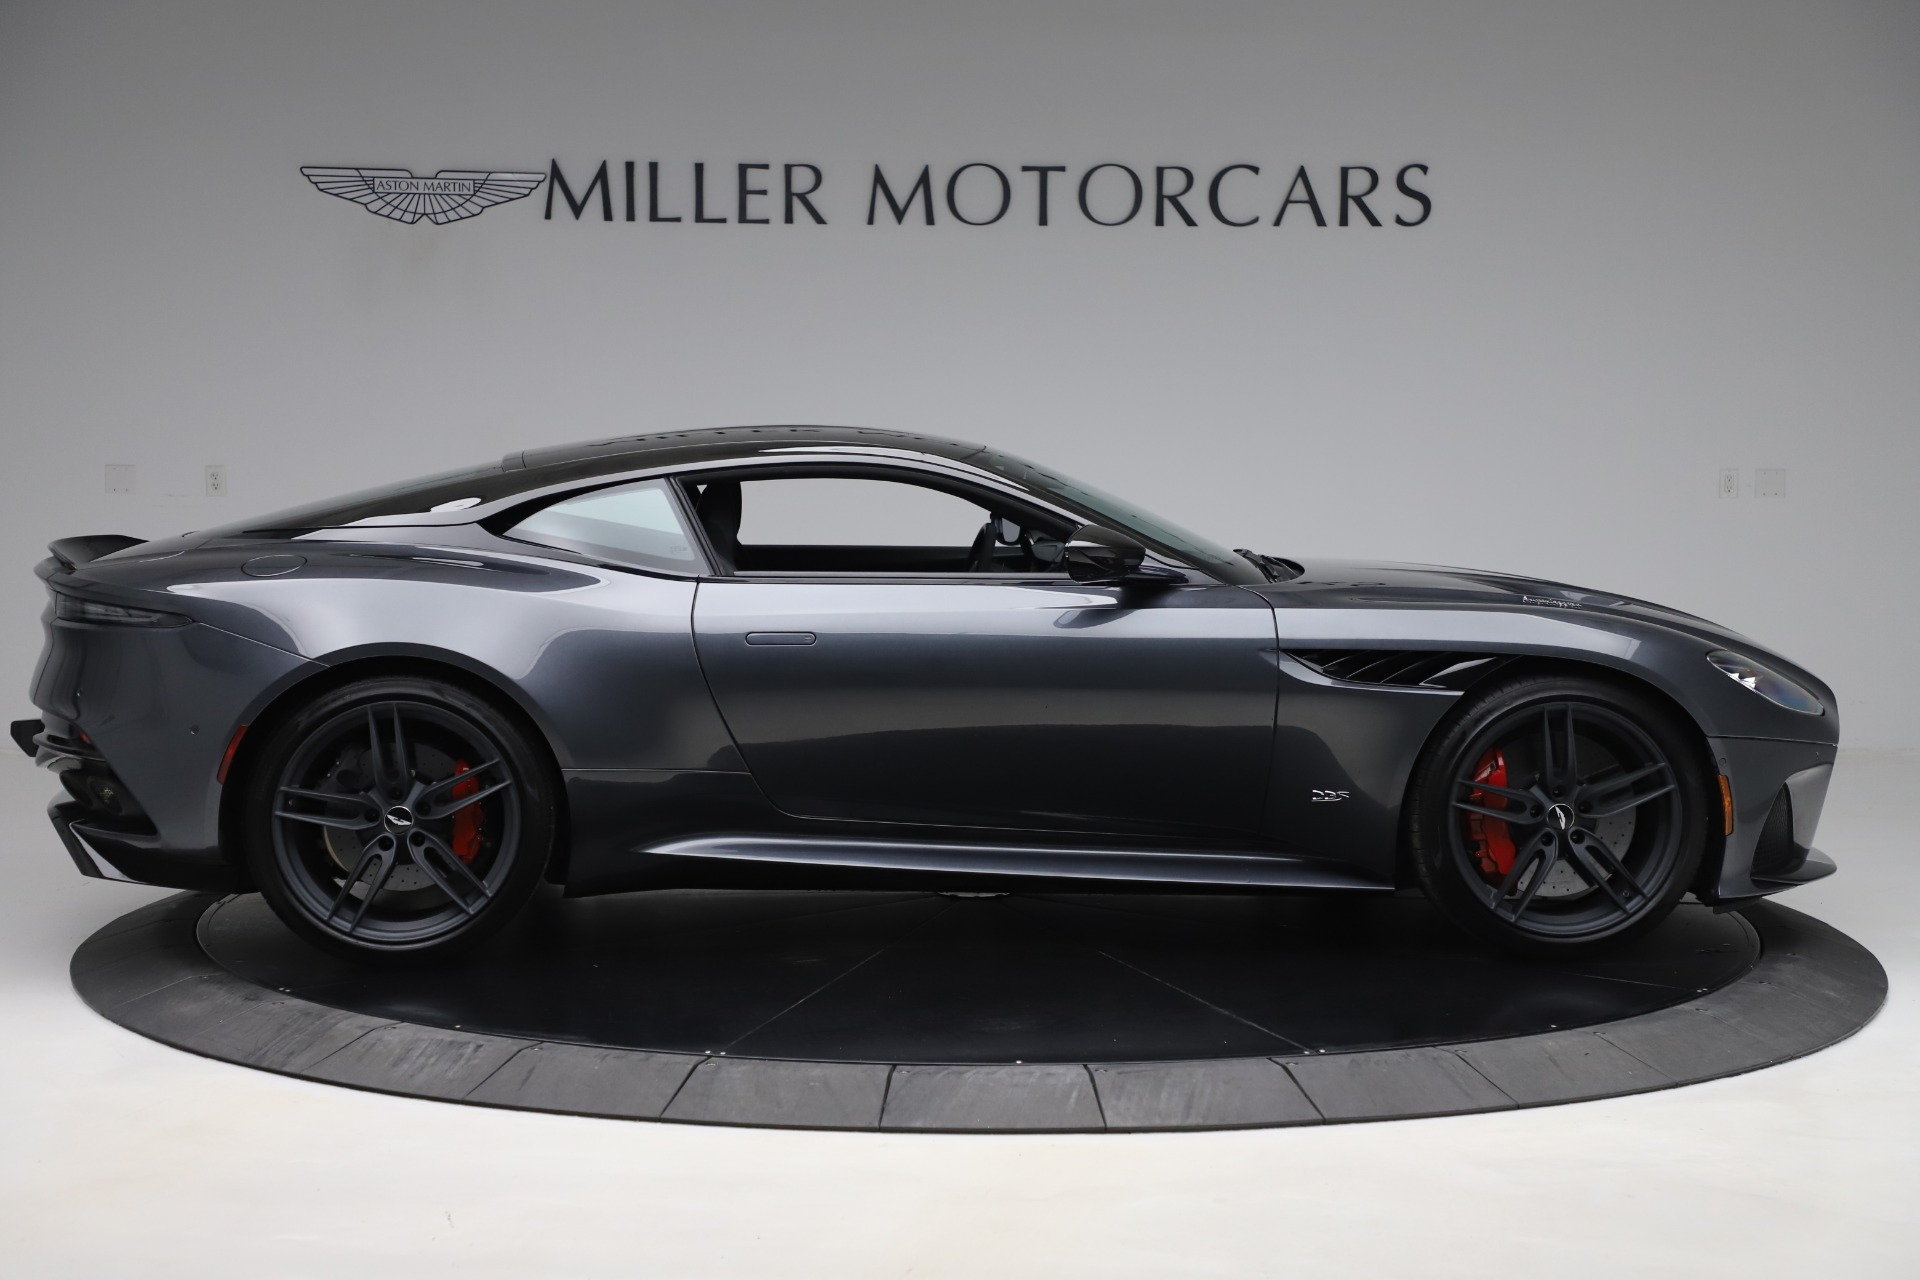 Used 2019 Aston Martin DBS Superleggera Coupe For Sale In Greenwich, CT. Alfa Romeo of Greenwich, A1438B 3570_p9